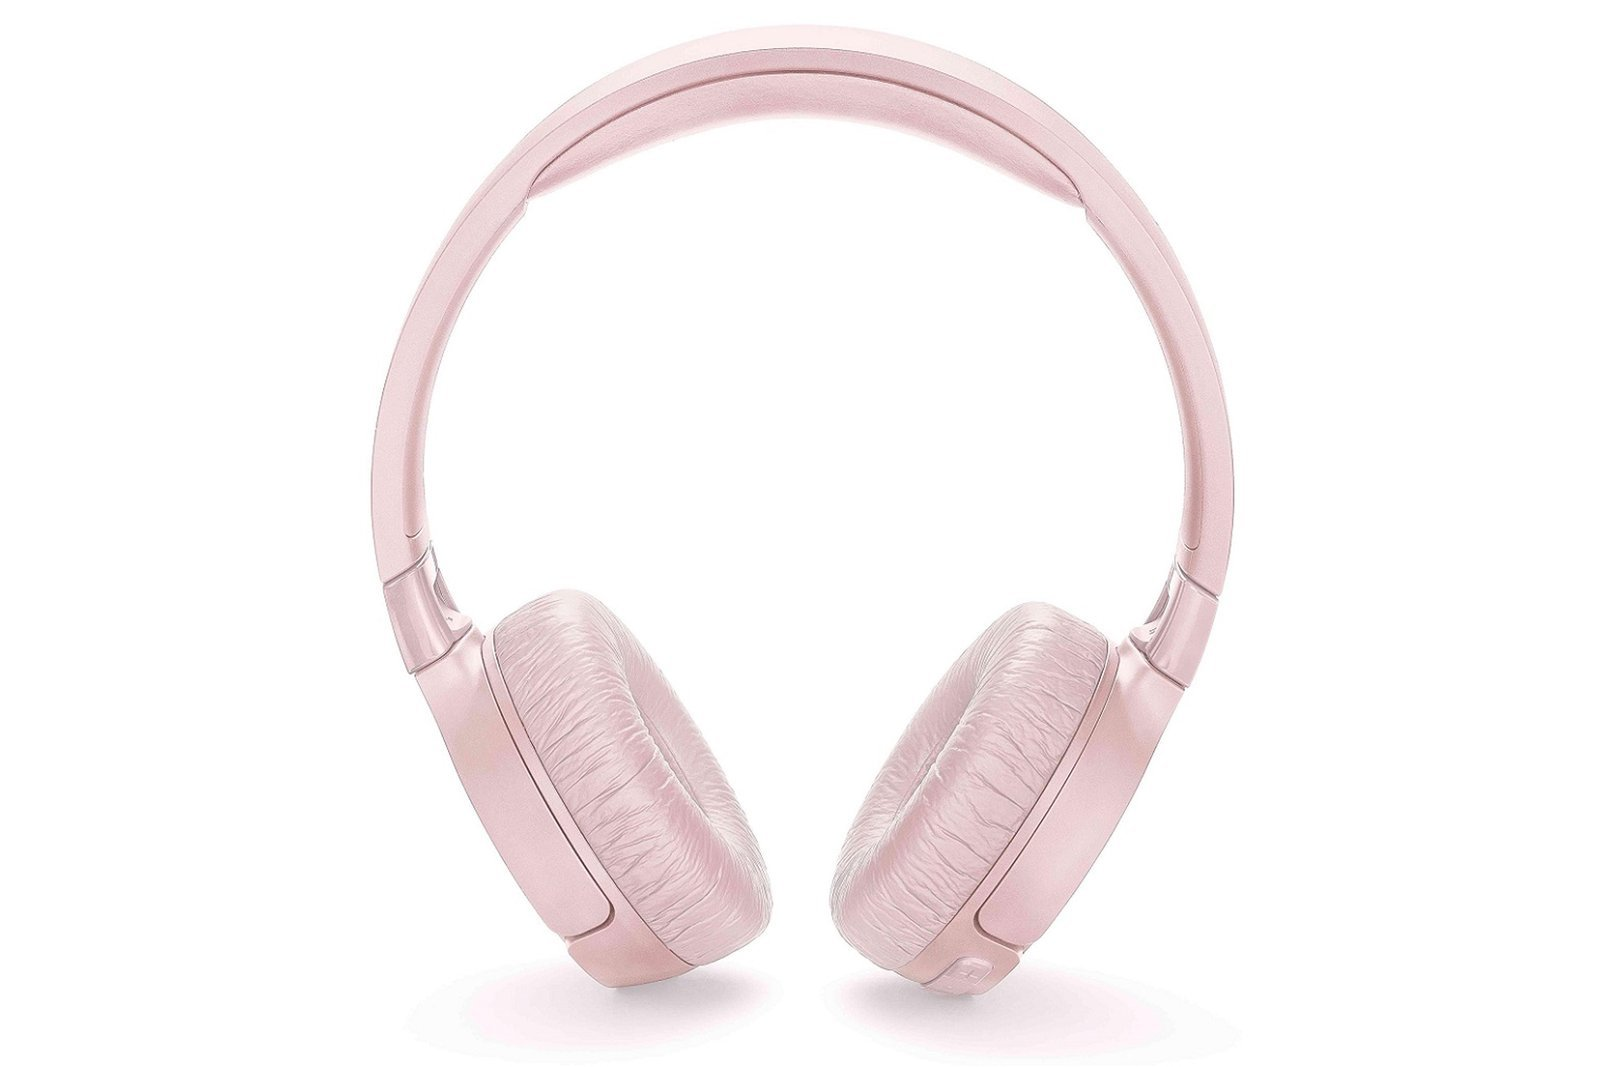 New Wireless Over-ear Noise-cancelling Headphones JBL 600BTNC TUNE600BTNC Pink